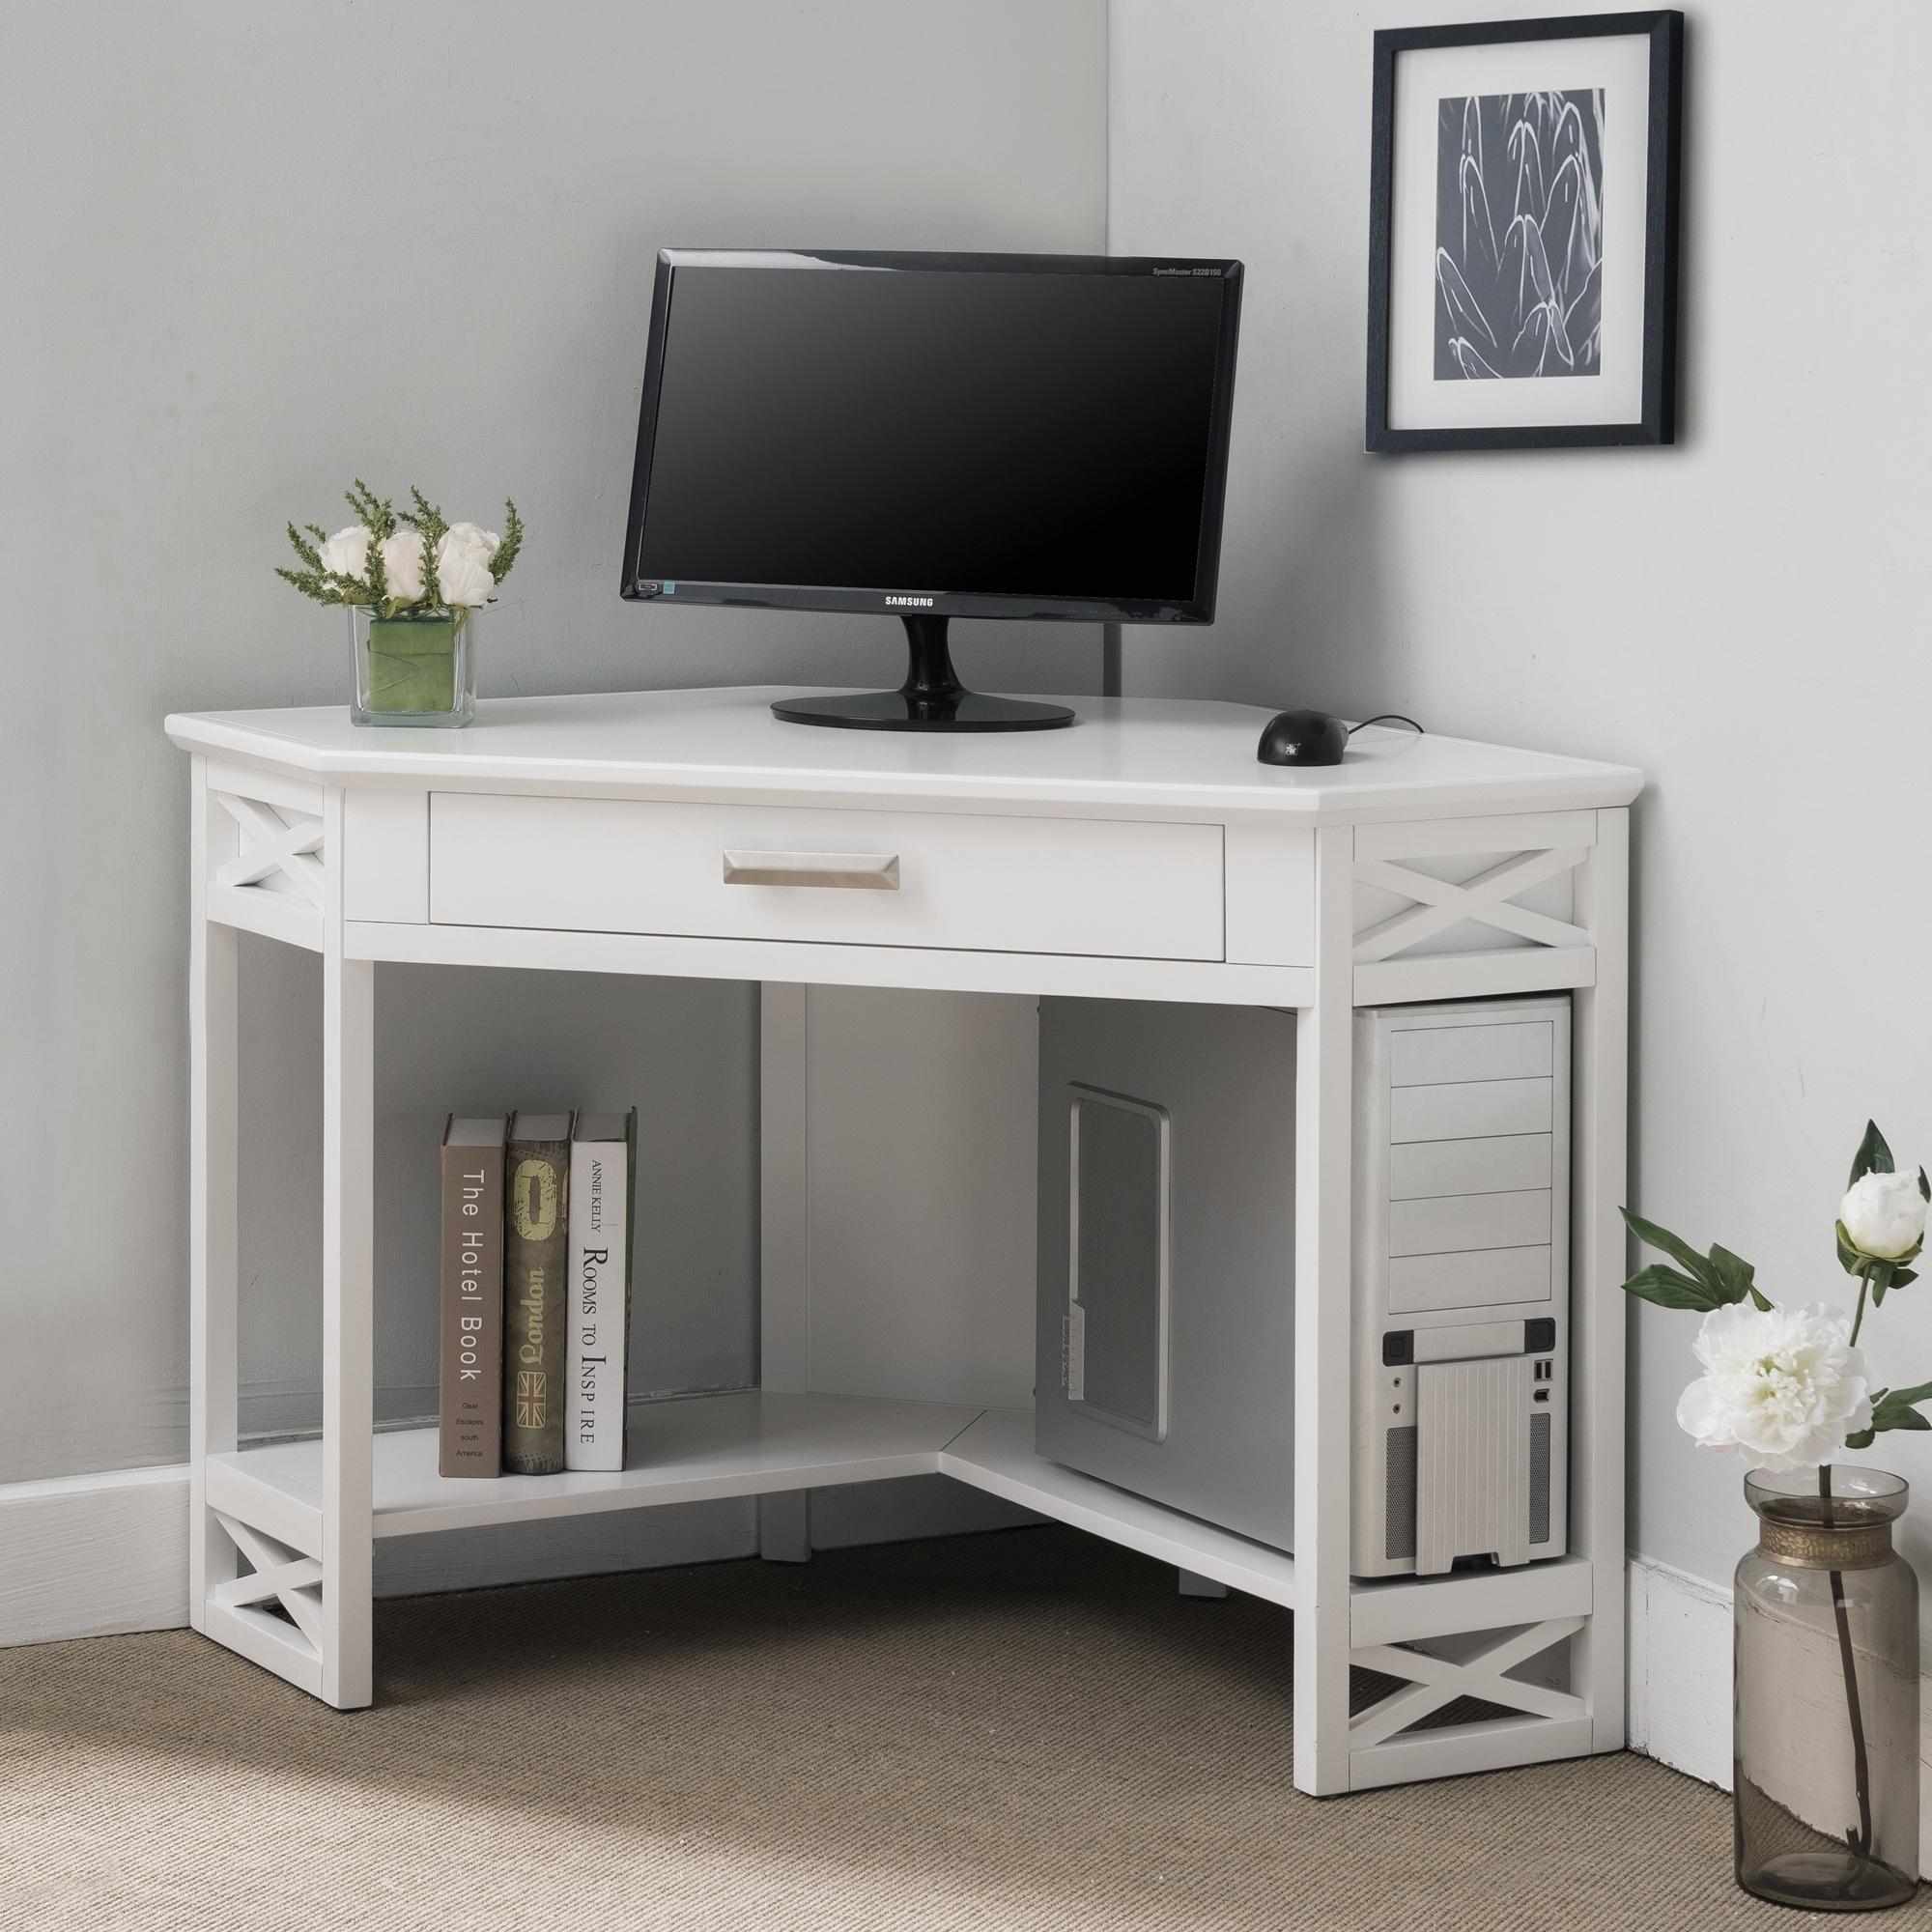 Shop Black Friday Deals On White Wood Corner Computer Writing Desk Overstock 20553181